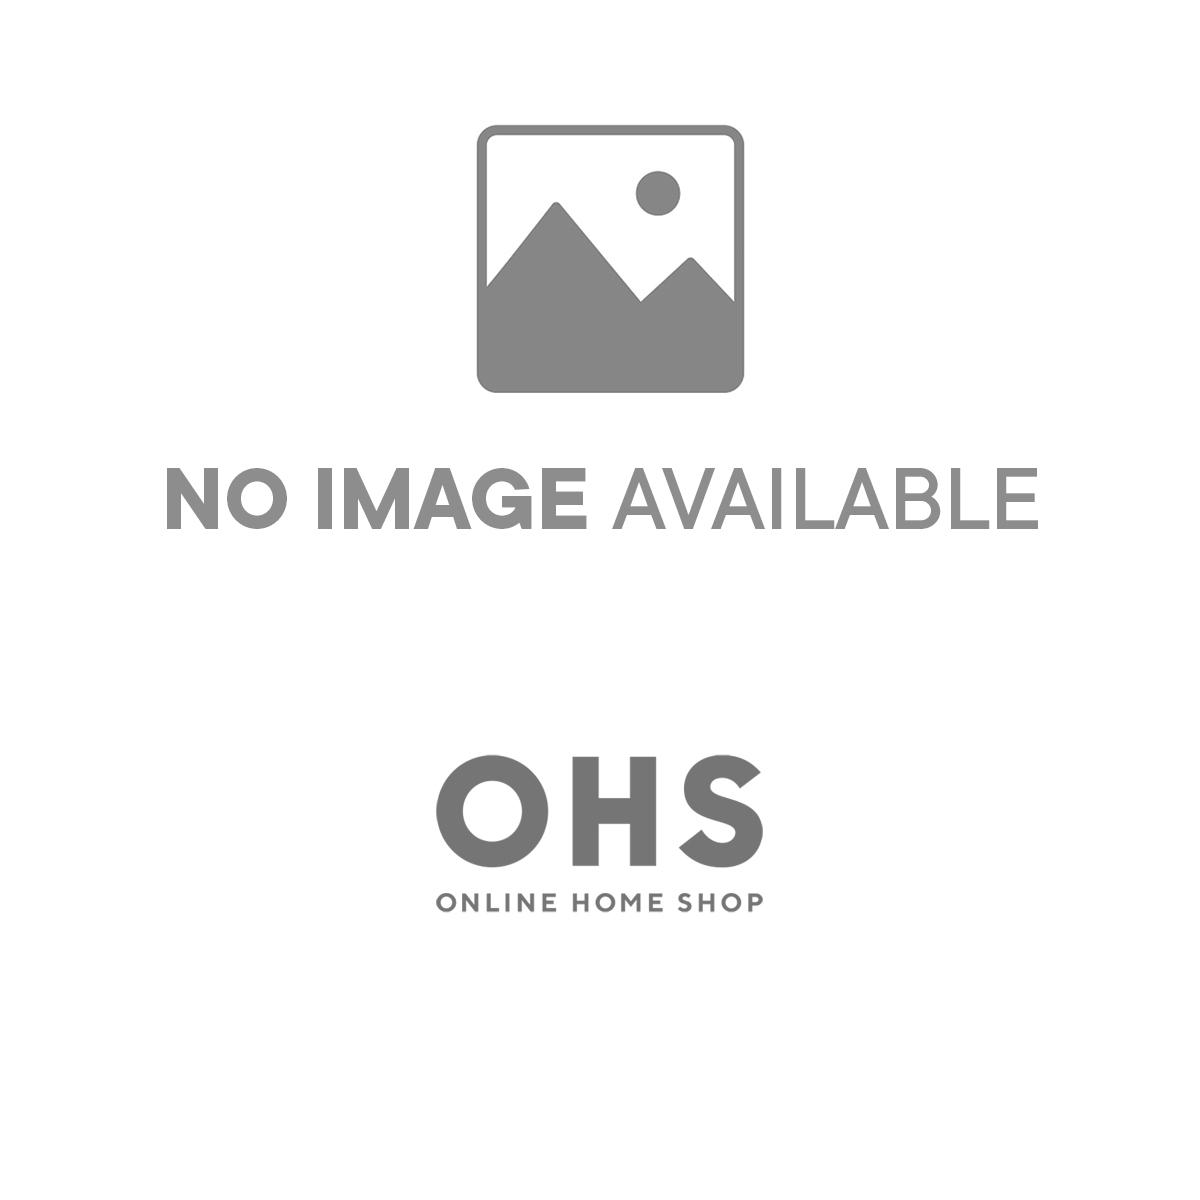 Dreamscene Tartan Scottie Dog 5 Piece Bed in a Bag Duvet Cover - Chocolate Brown - Single